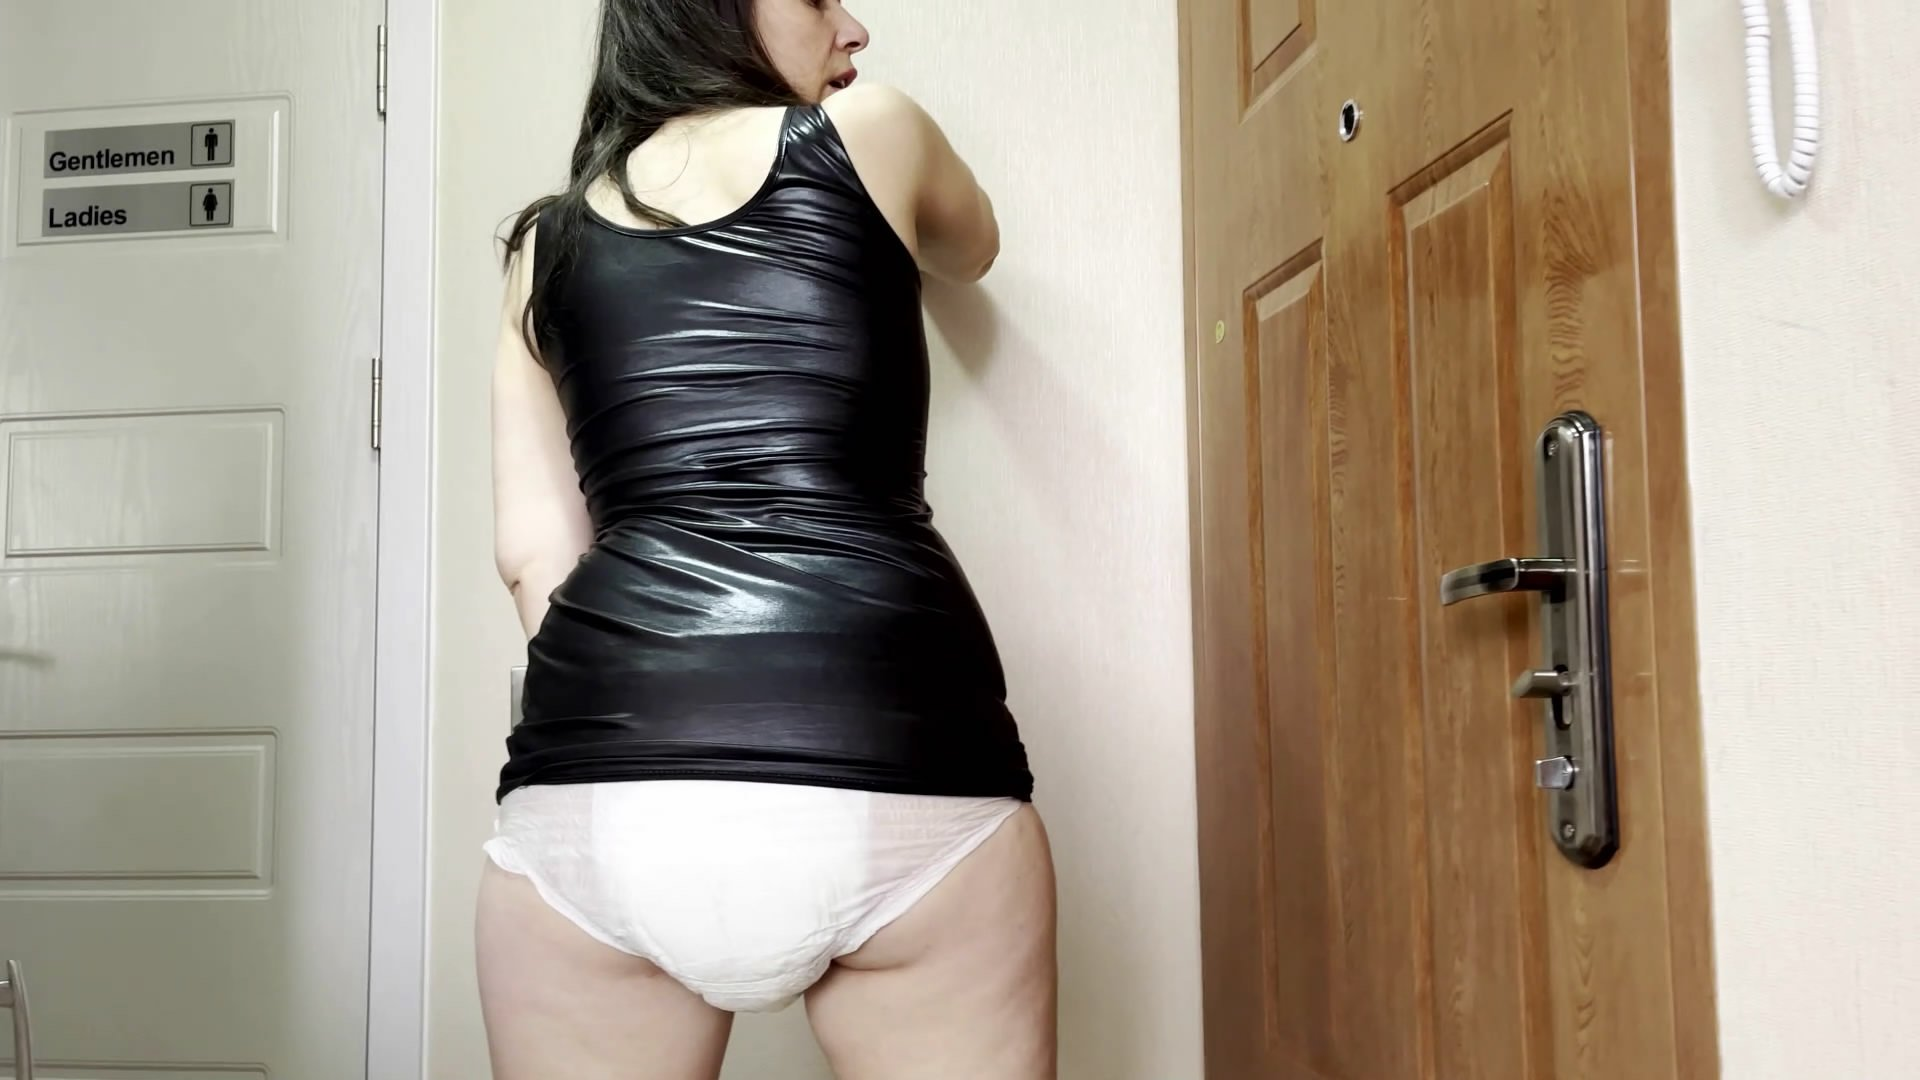 My Messy Diaper 4 U starring in video thefartbabes ($13.99 ScatShop) –  Diapers/ABDL